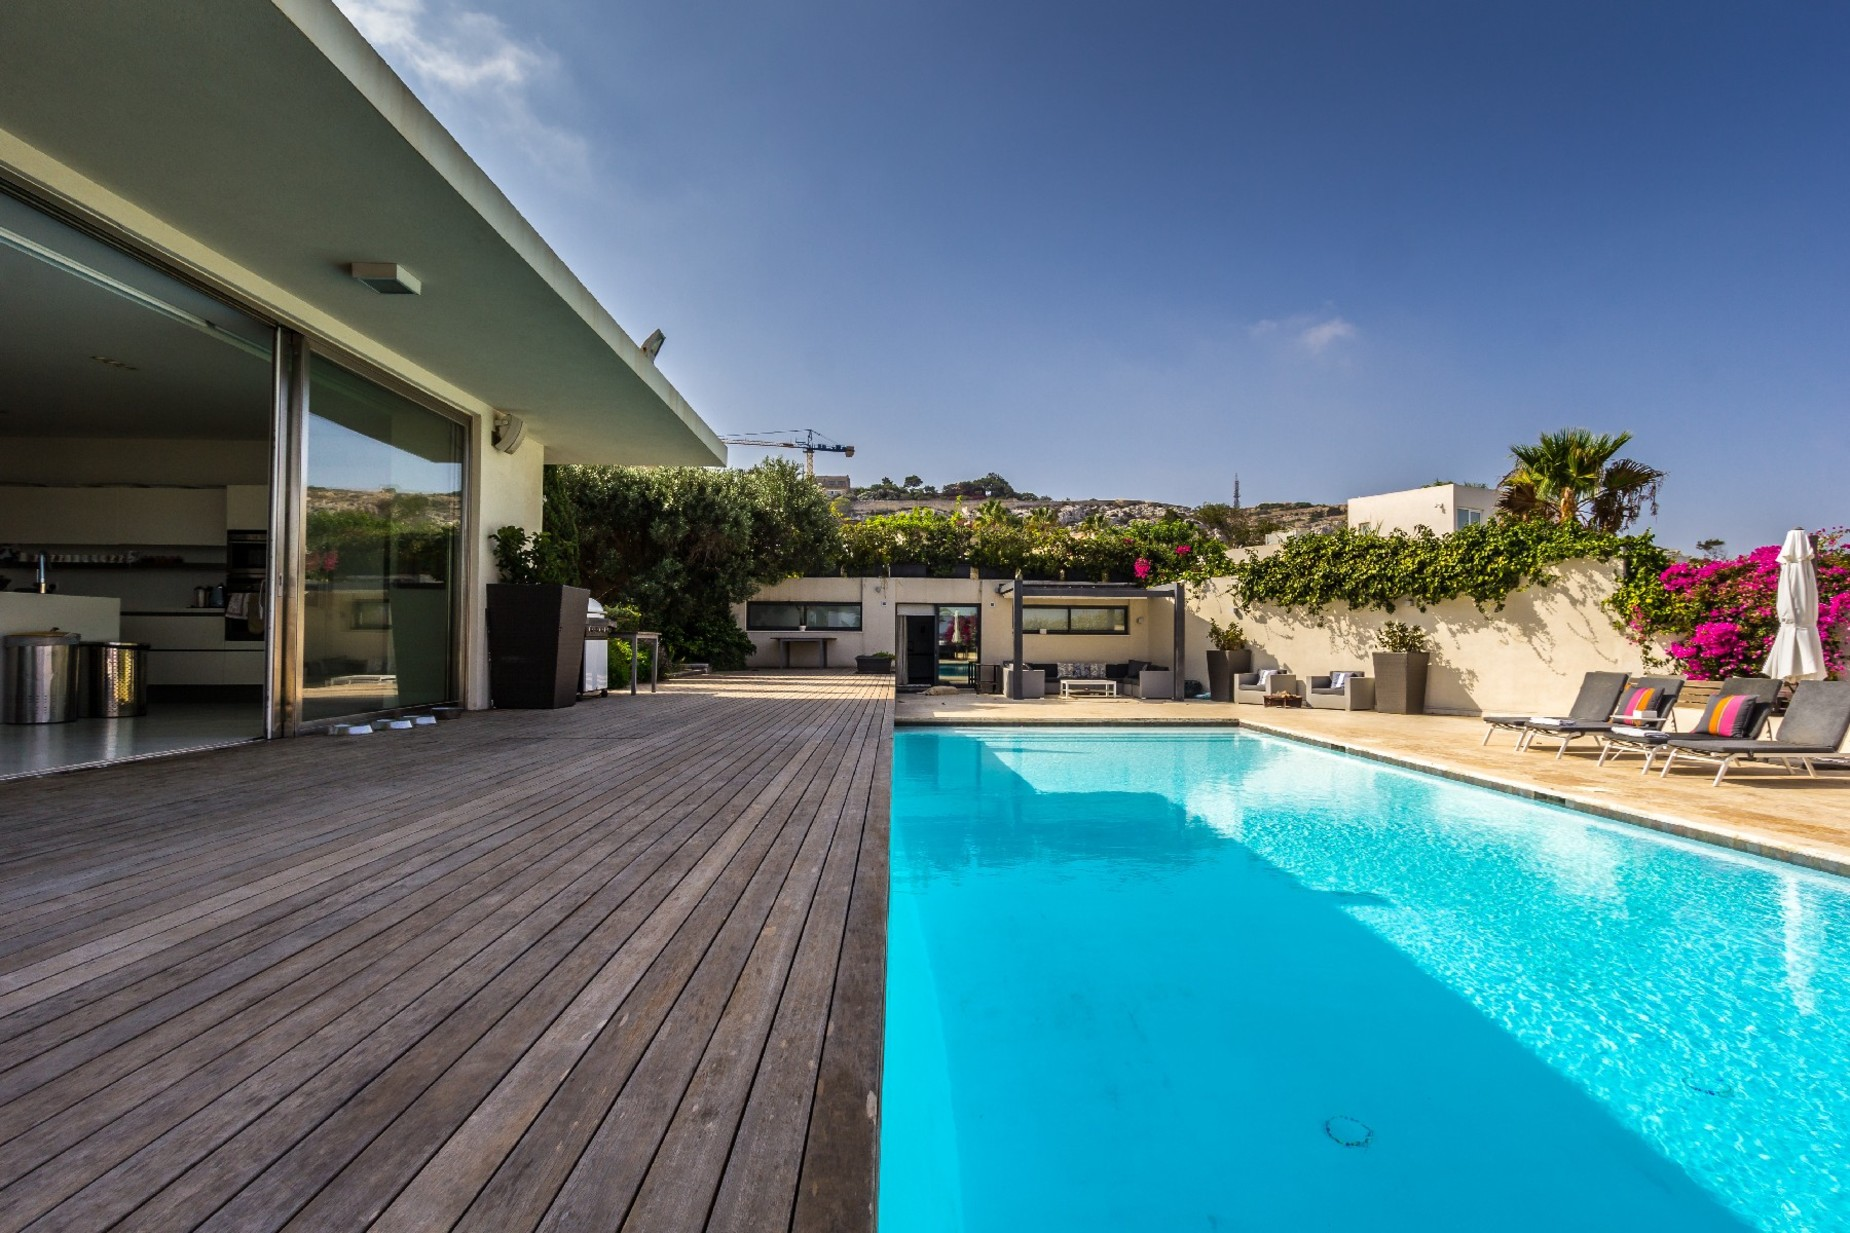 7 bed Villa For Sale in Bahar ic-Caghaq, Bahar ic-Caghaq - thumb 6